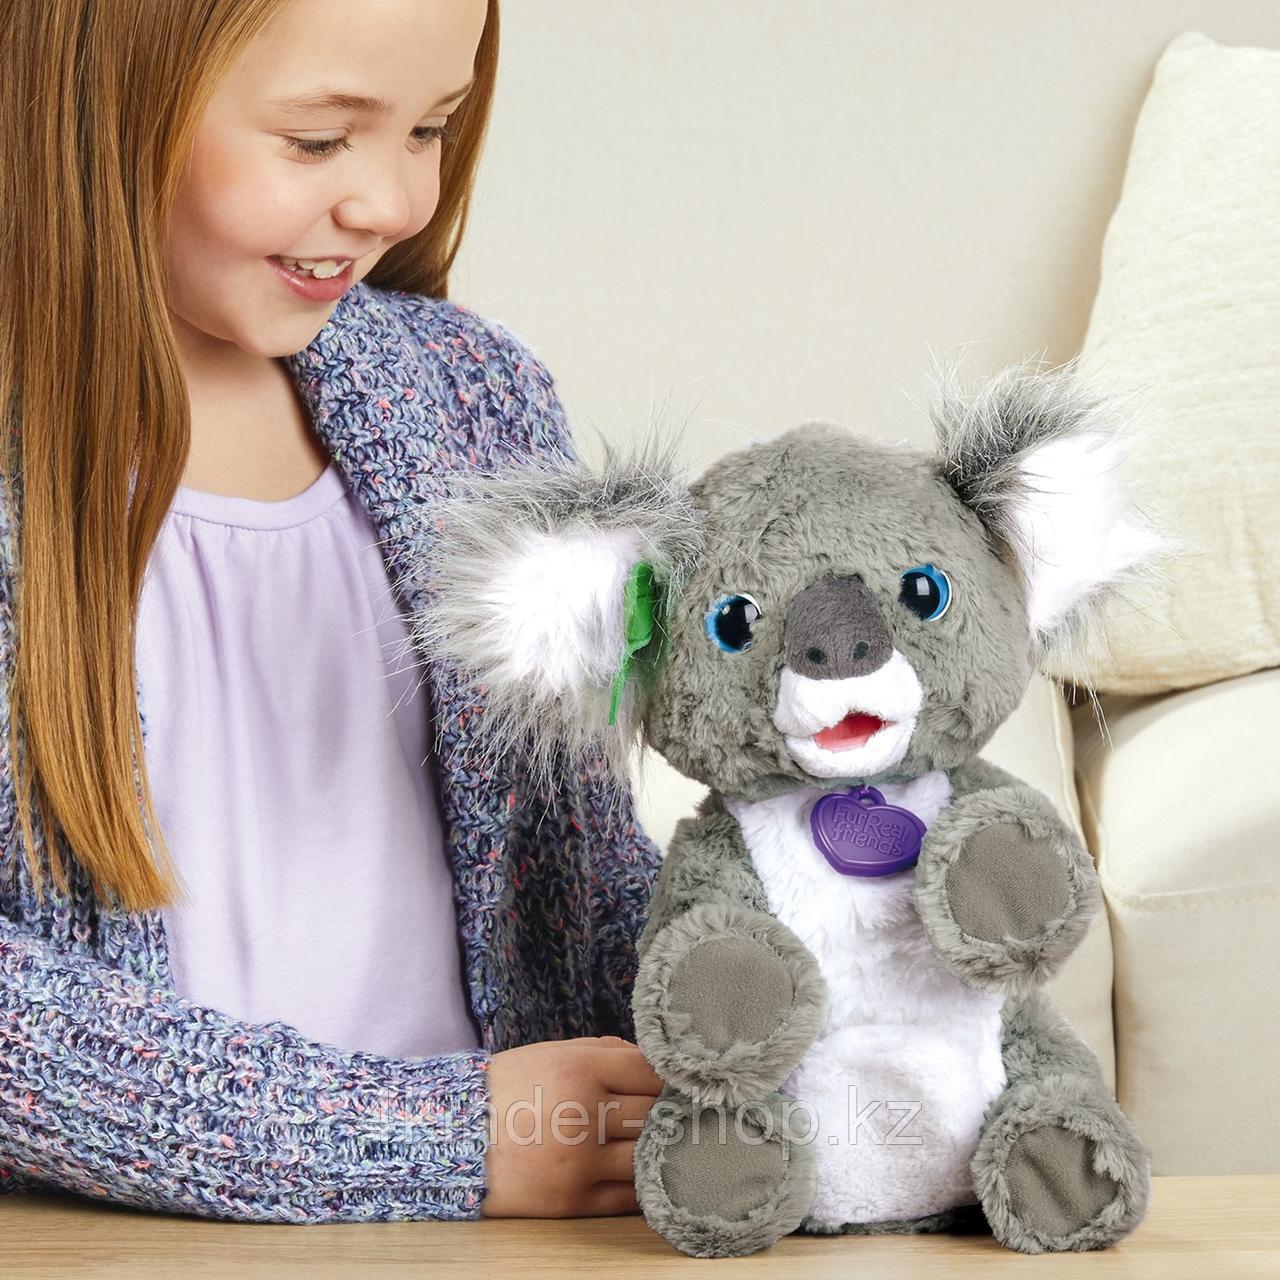 Игрушка FurReal Friends Коала Кристи - фото 2